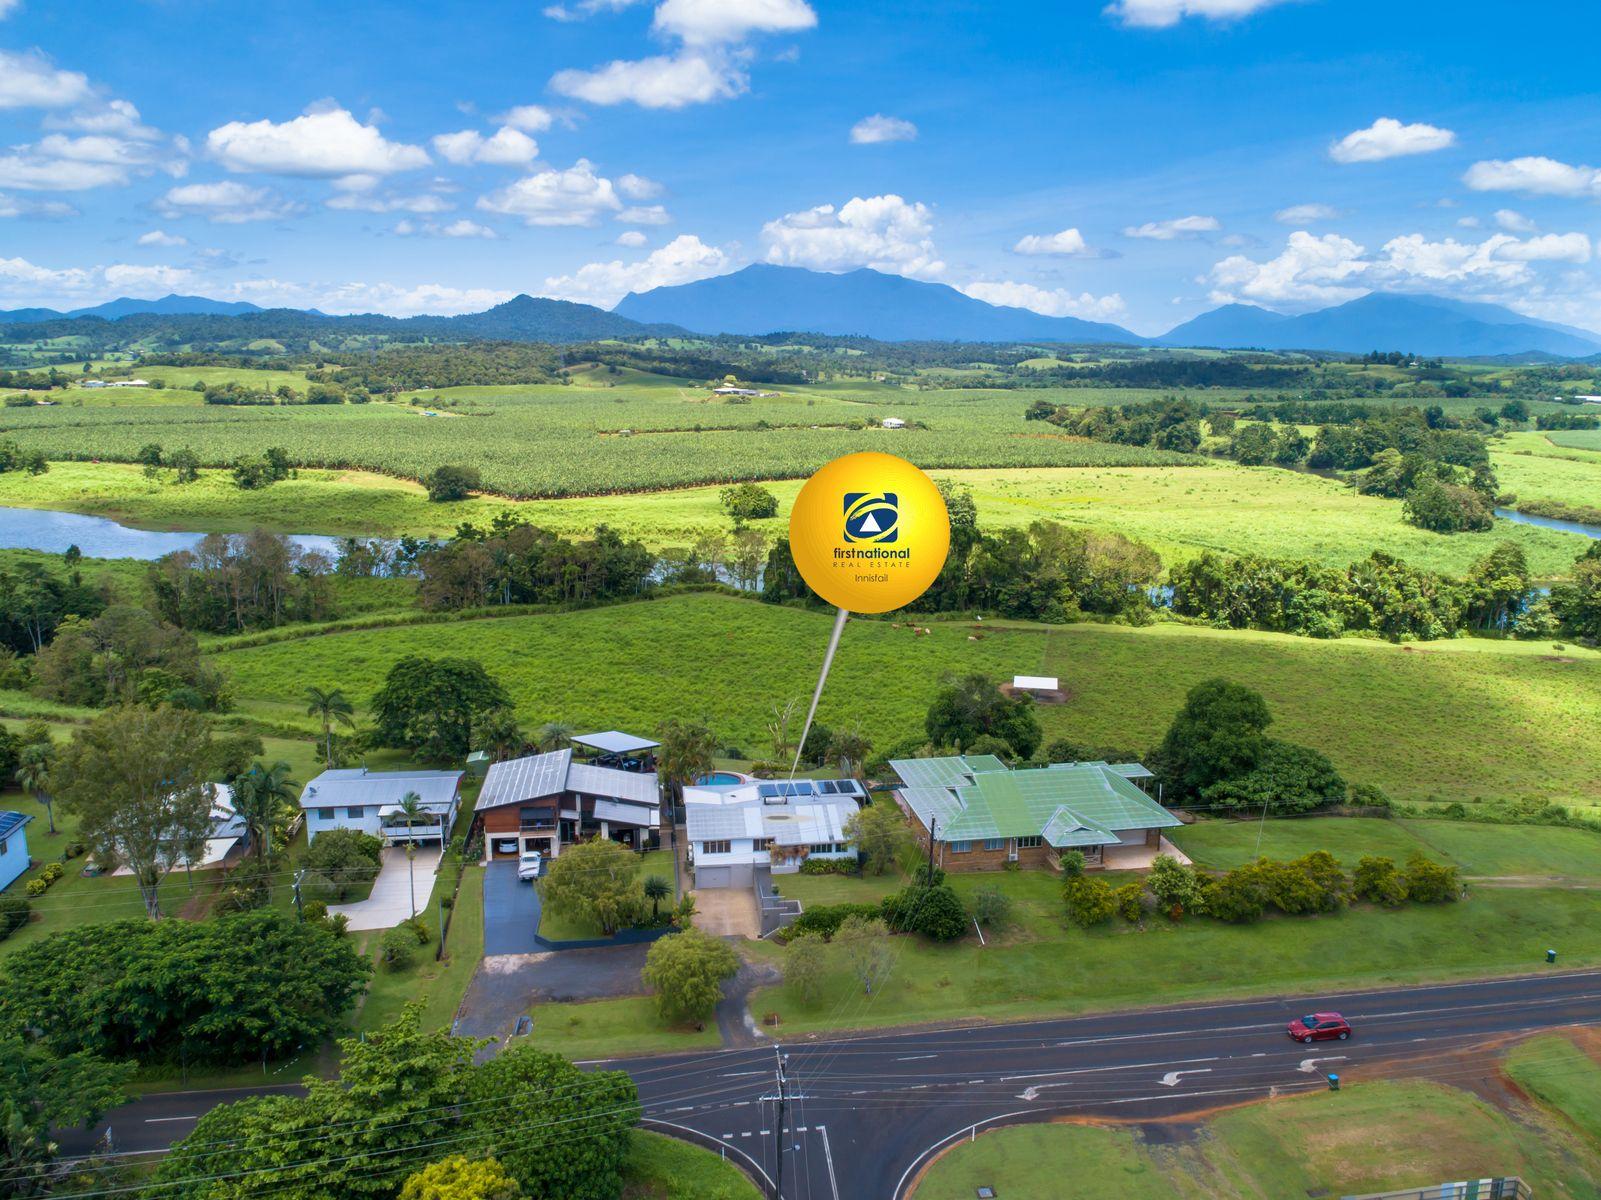 425 Palmerston Highway, O'Briens Hill, QLD 4860